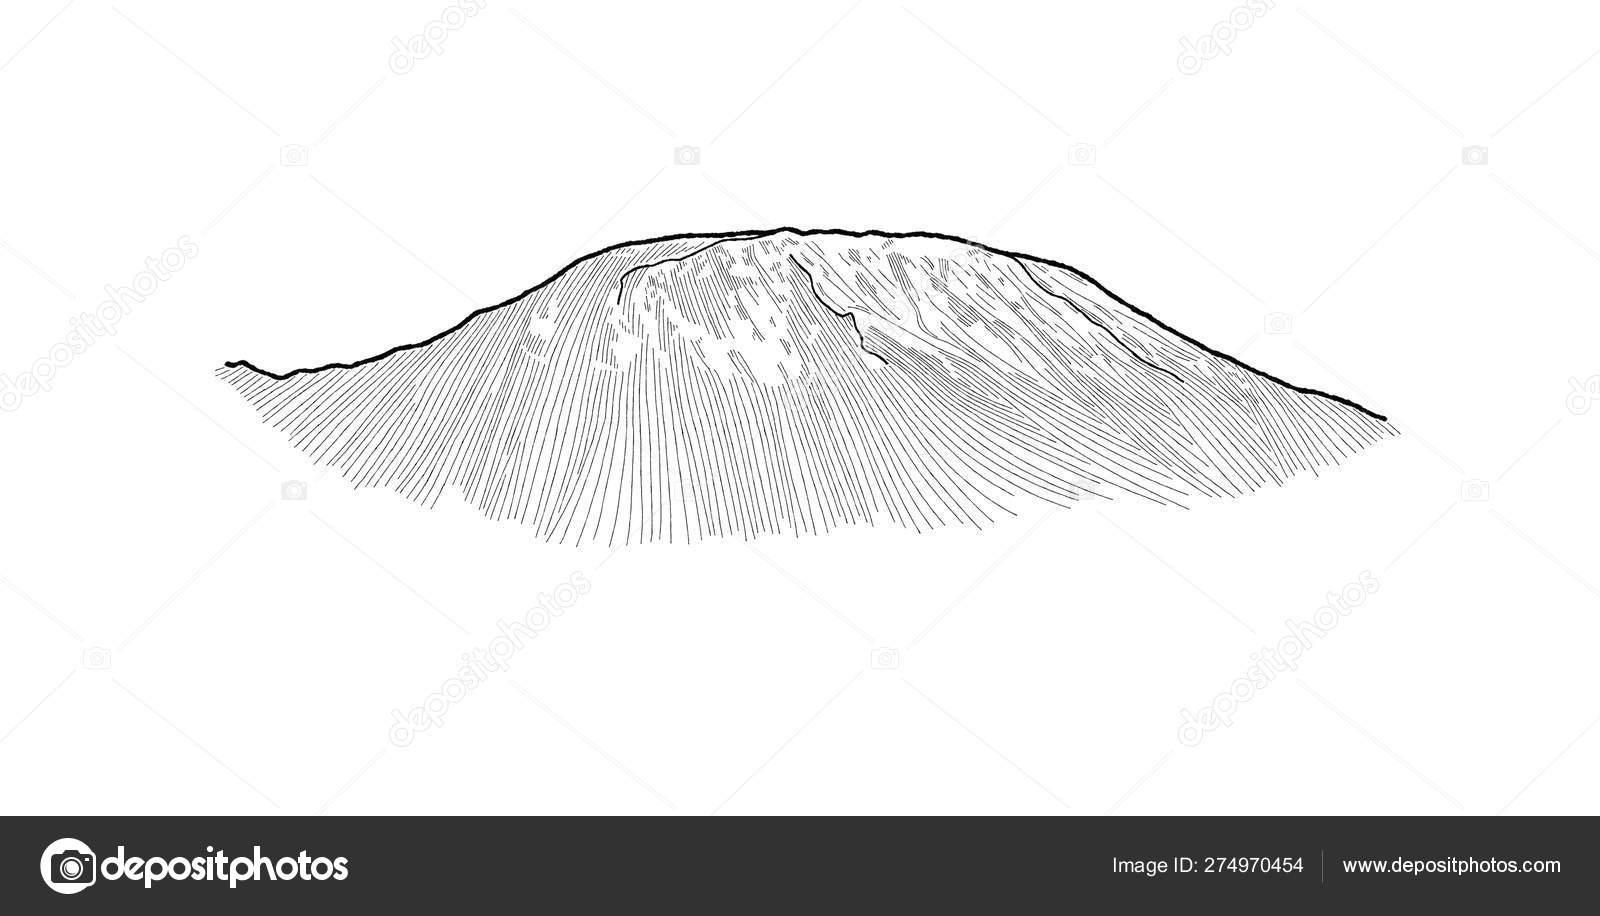 Kilimanjaro North East Tanzania Africa Landmark Vector Illustration